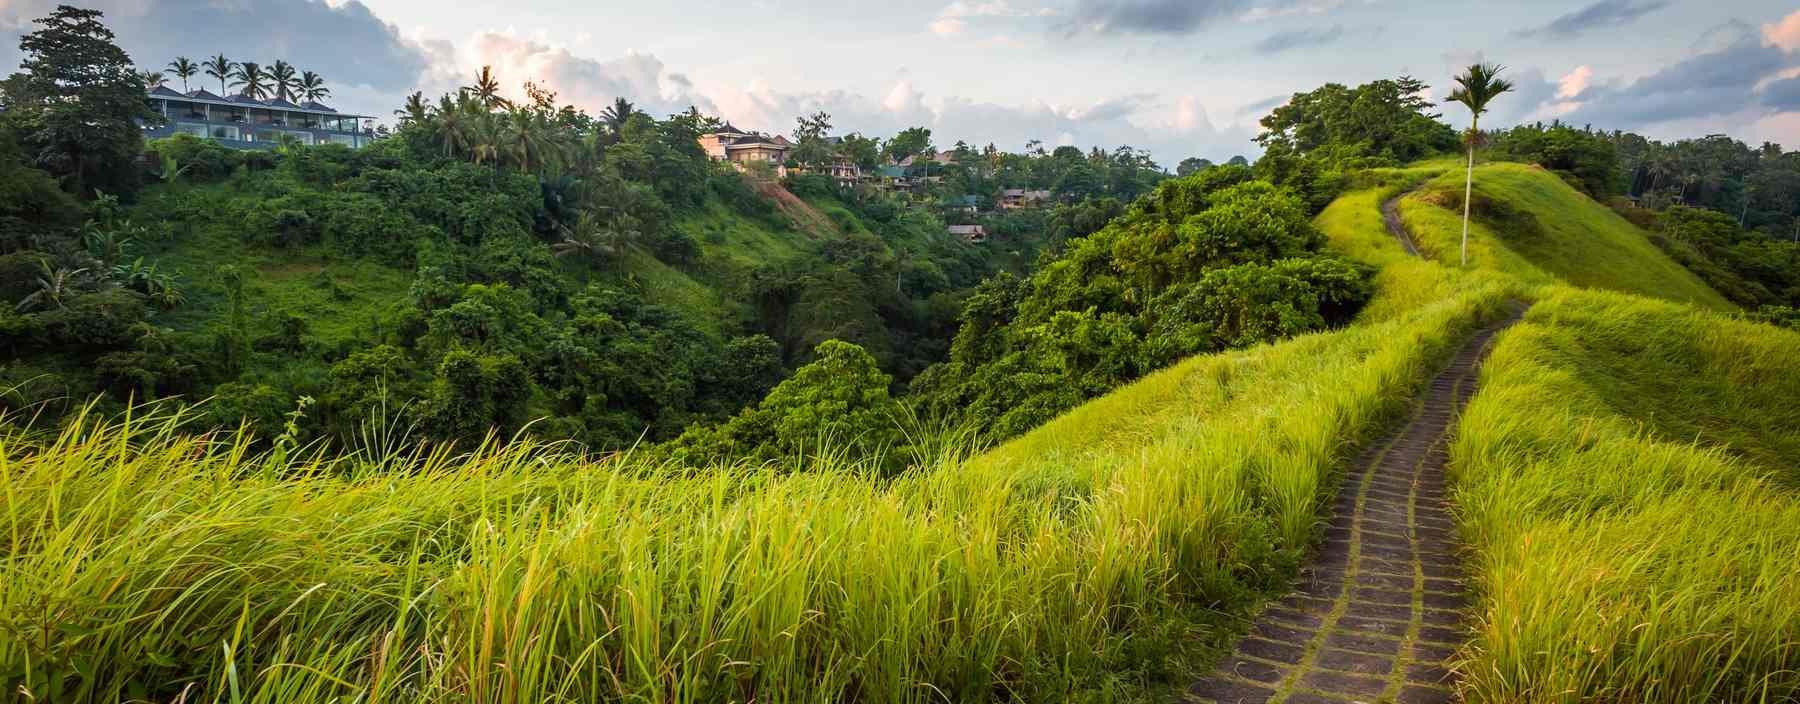 id, bali, stone road in ubud.jpg